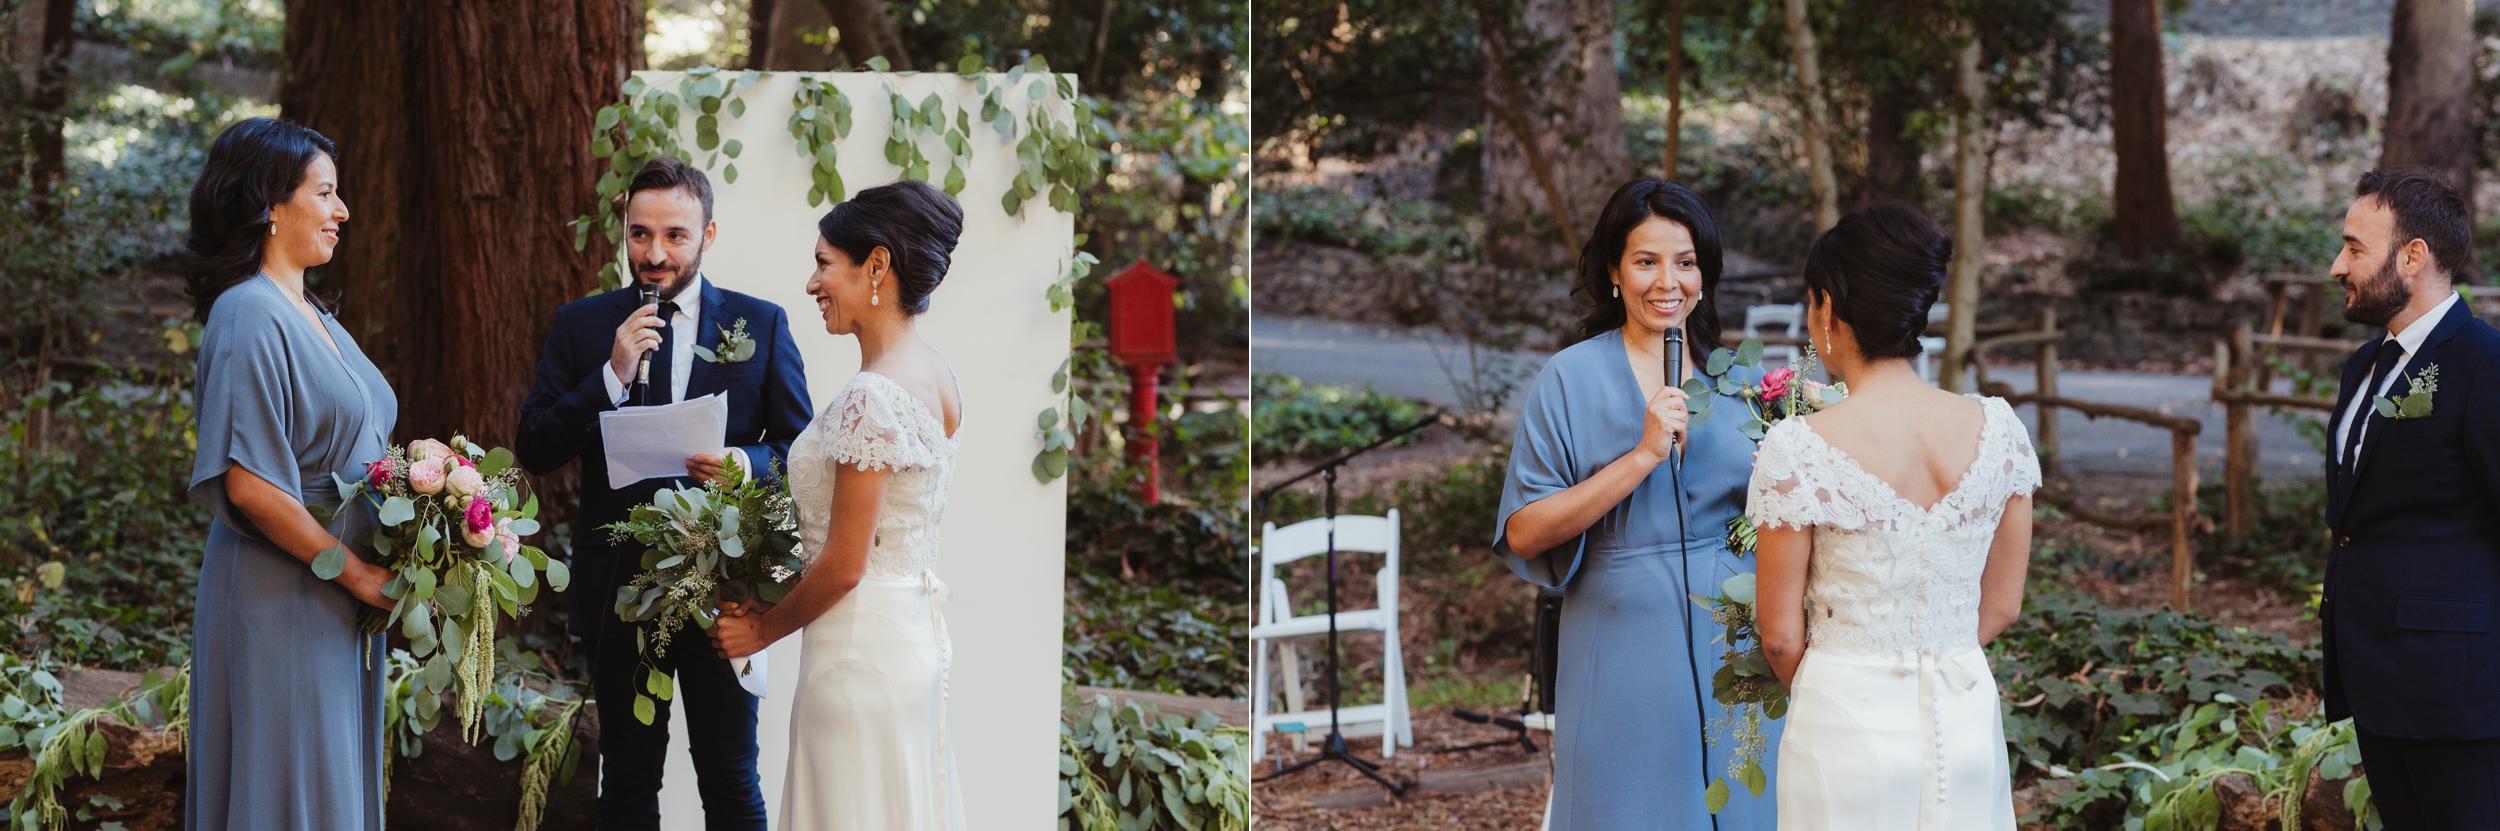 34san-francisco-stern-grove-wedding-photographer-vivianchen-240_WEB.jpg